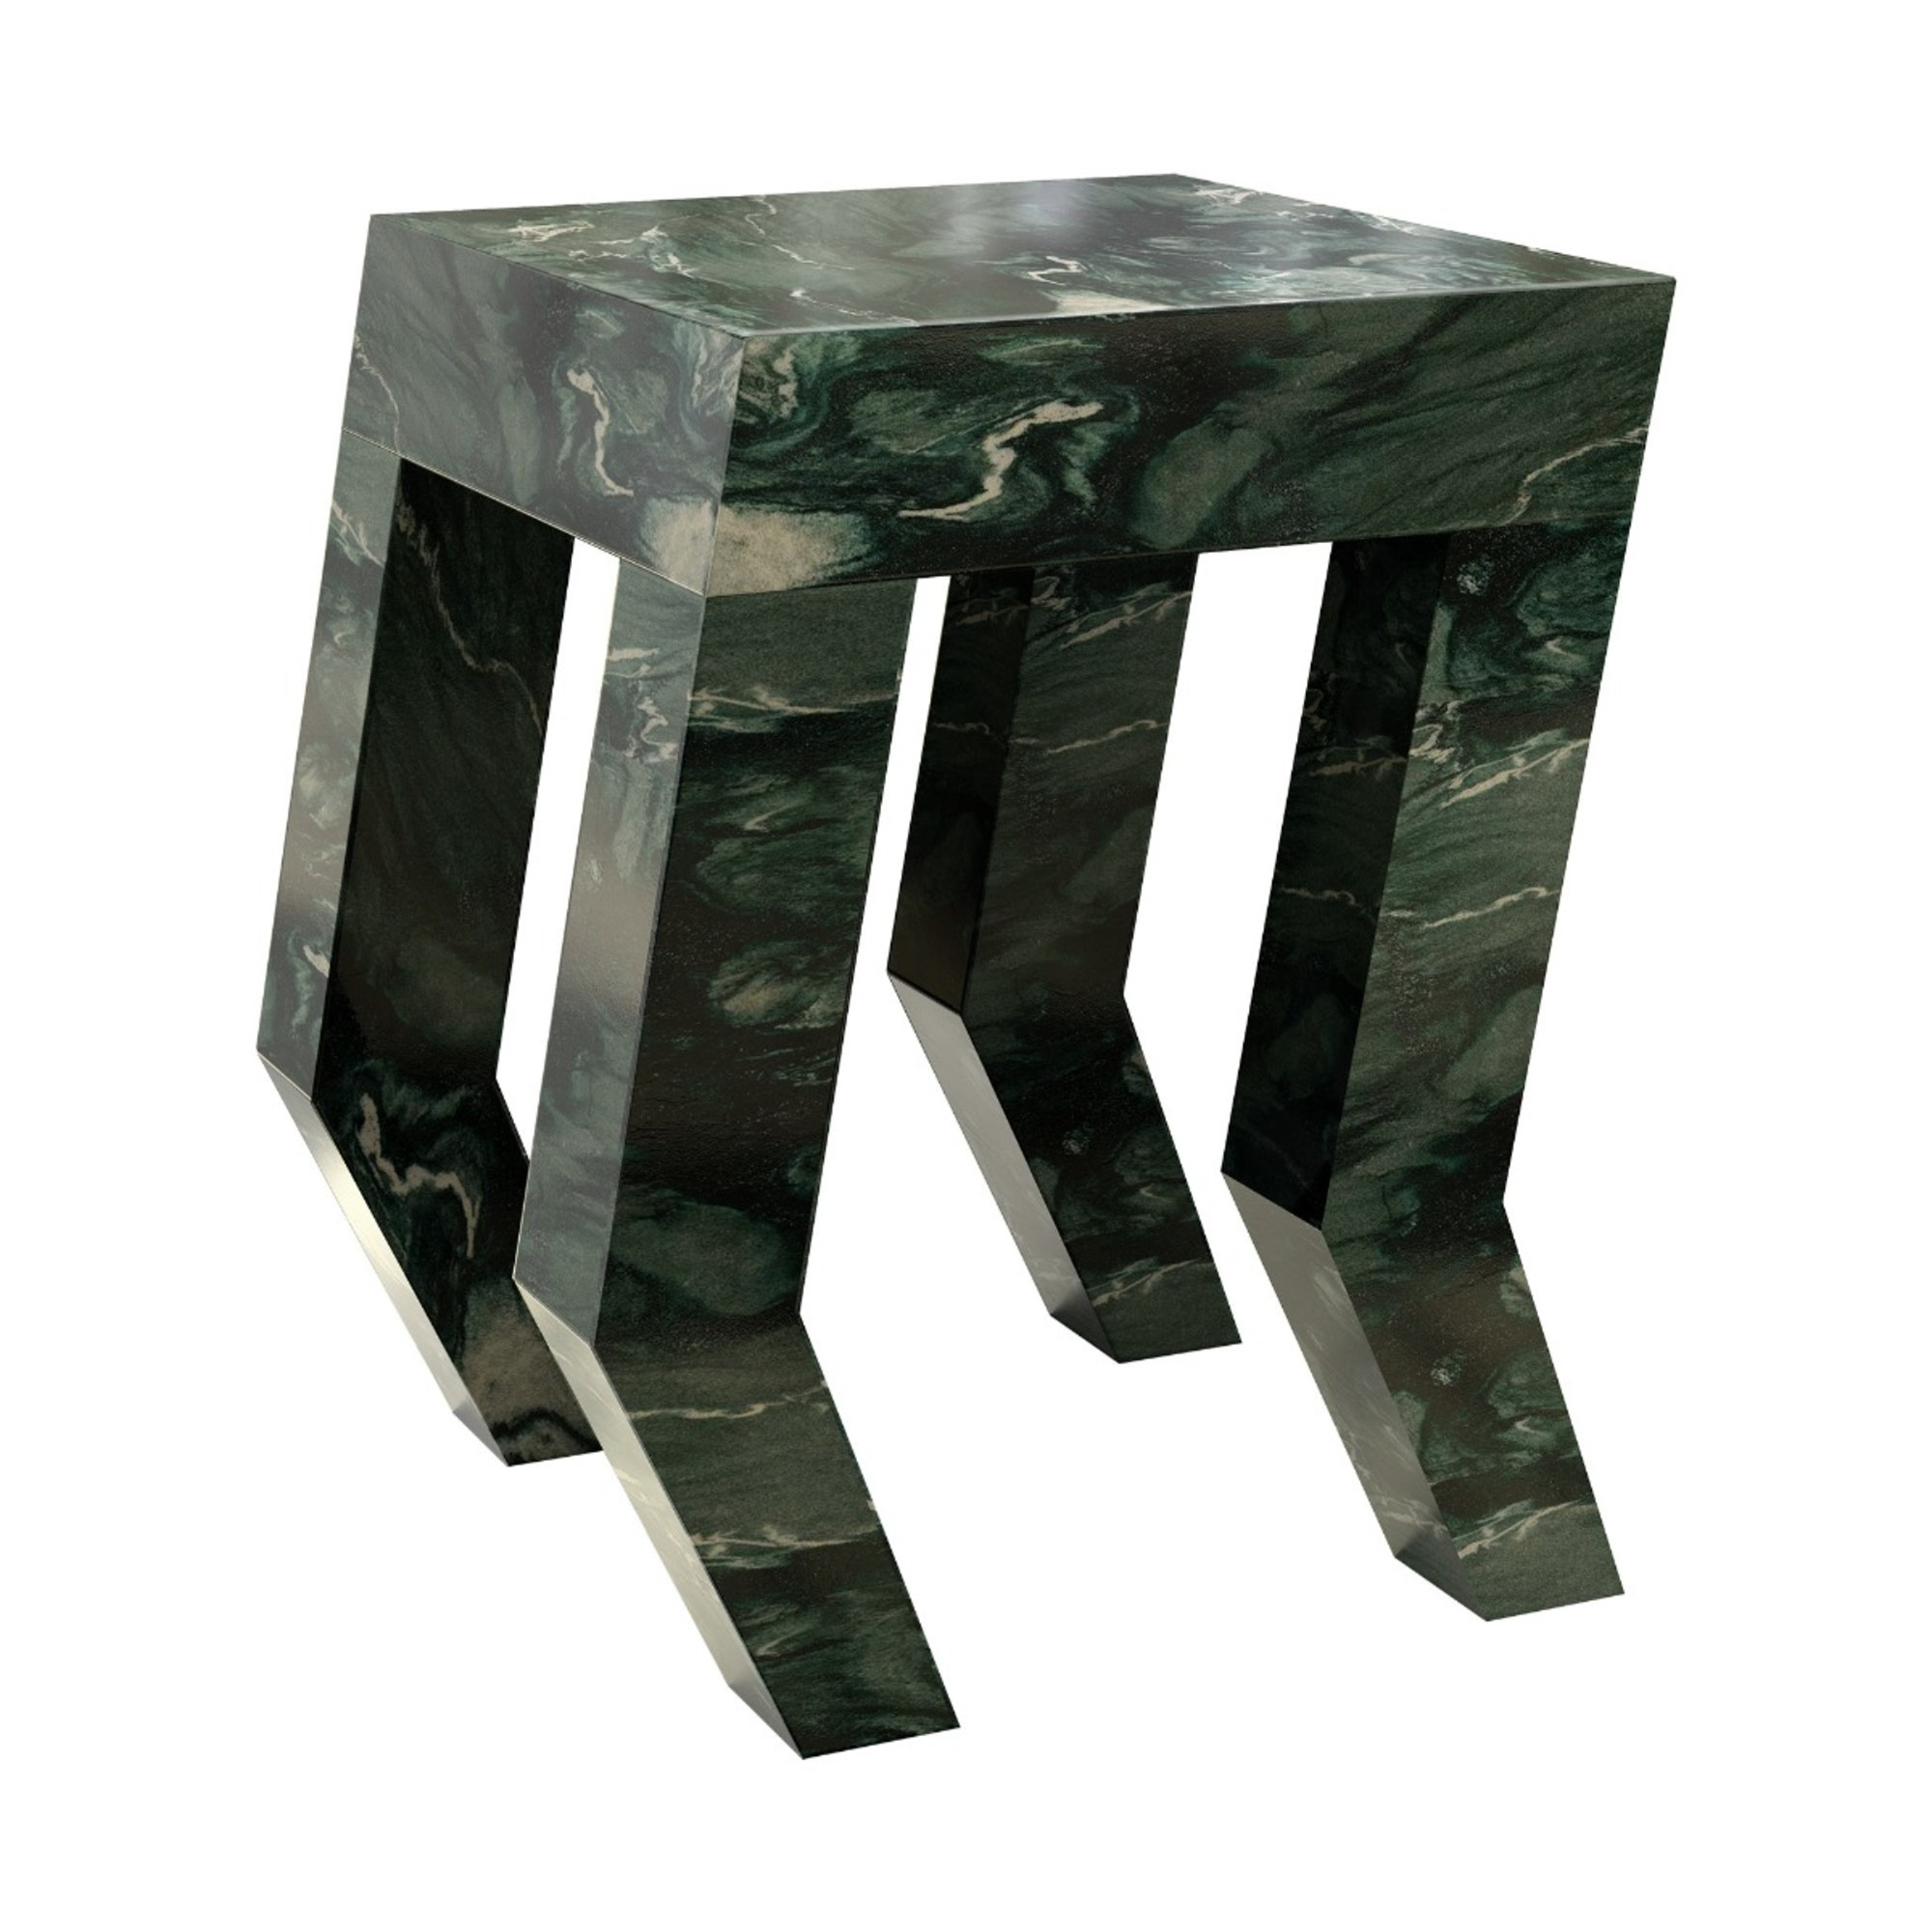 Atlas Green Marble Side Table